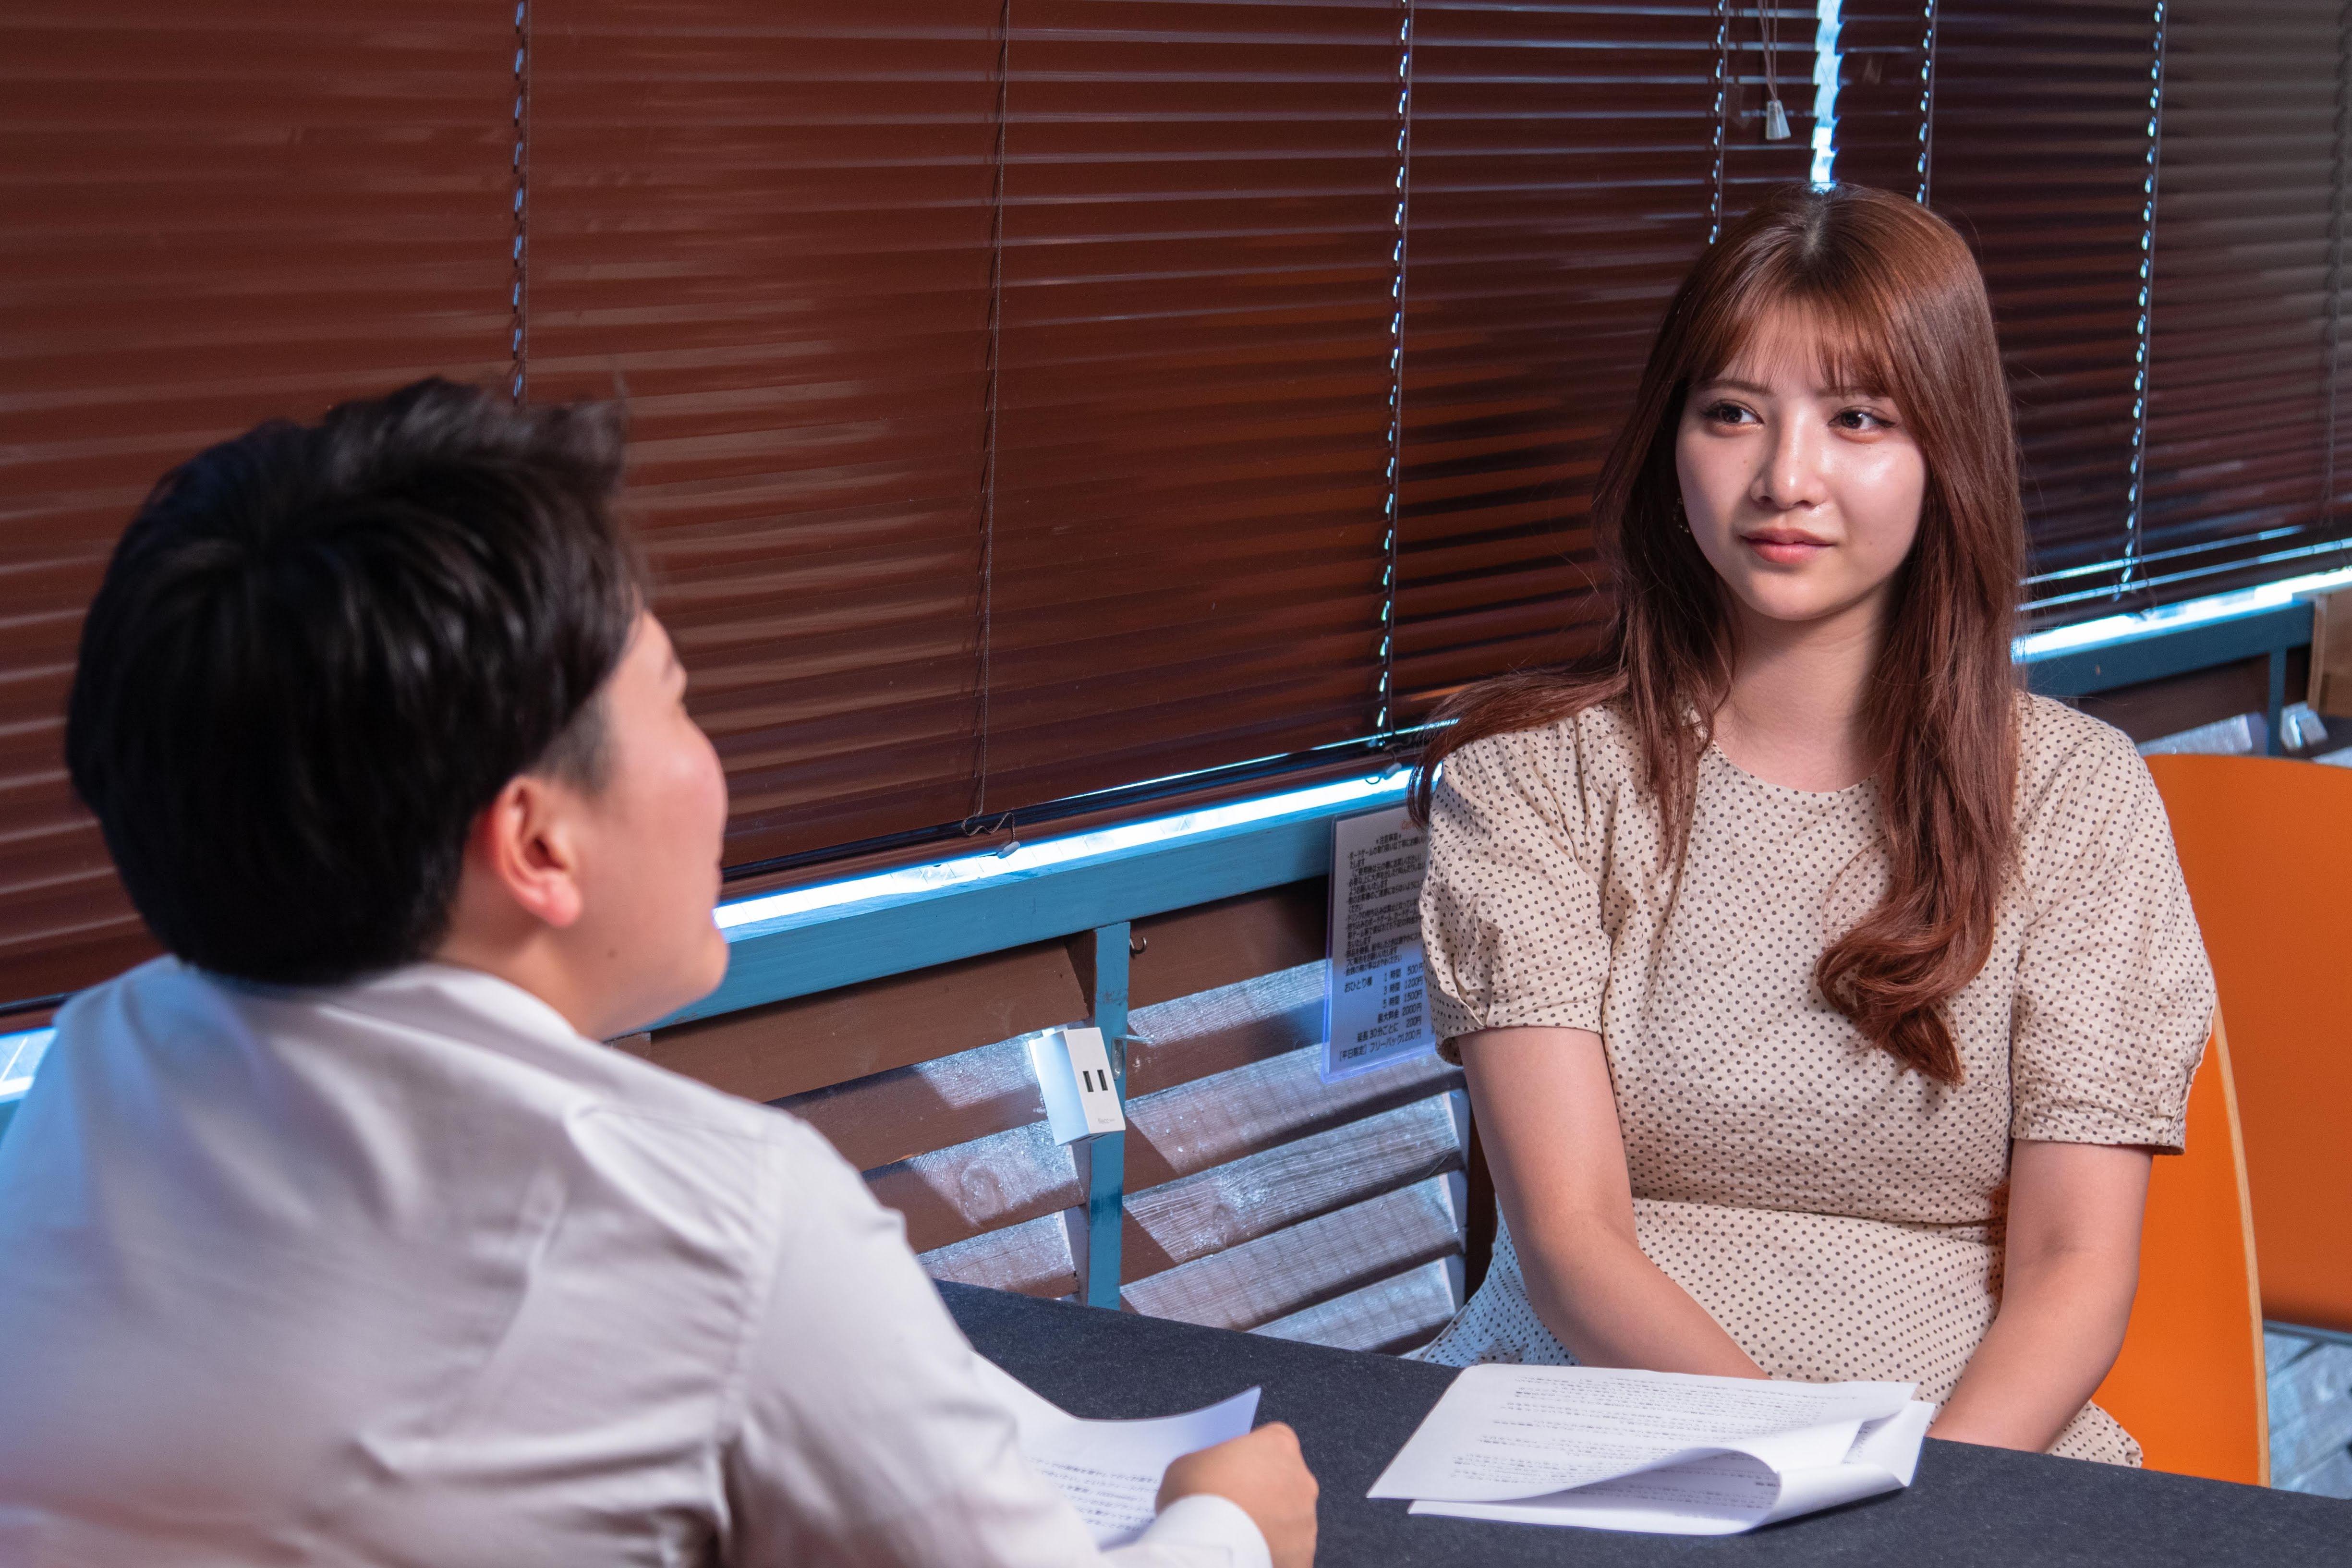 DINETTE株式会社 尾崎 美紀氏 インタビュー画像